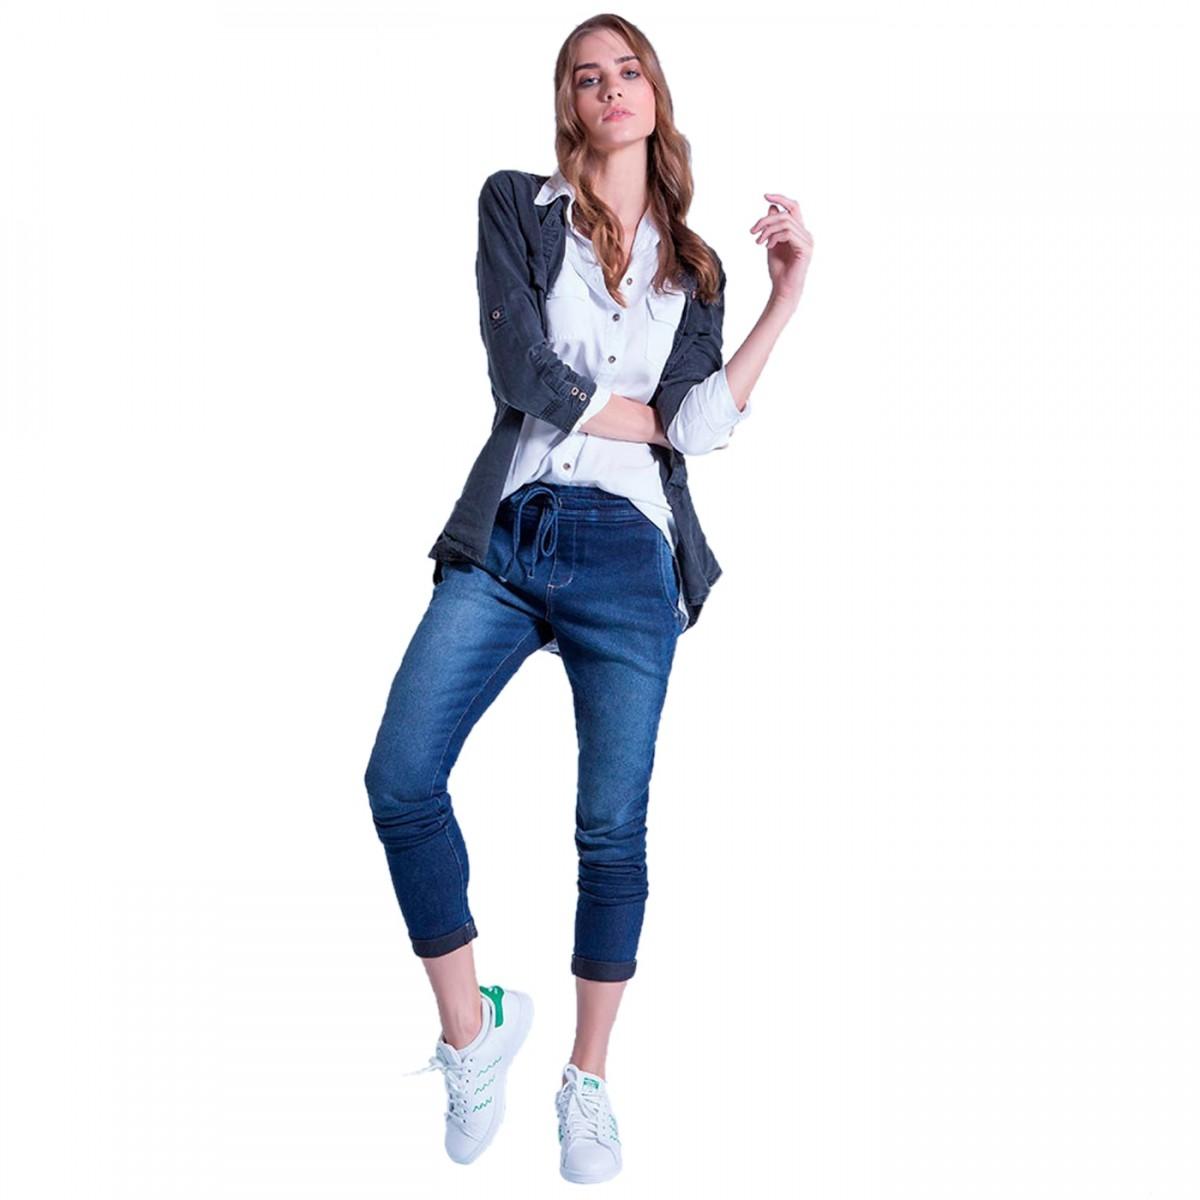 5195d1d8fb Bizz Store - Calça Jeans Jogging Feminina Ana Hickmann Azul